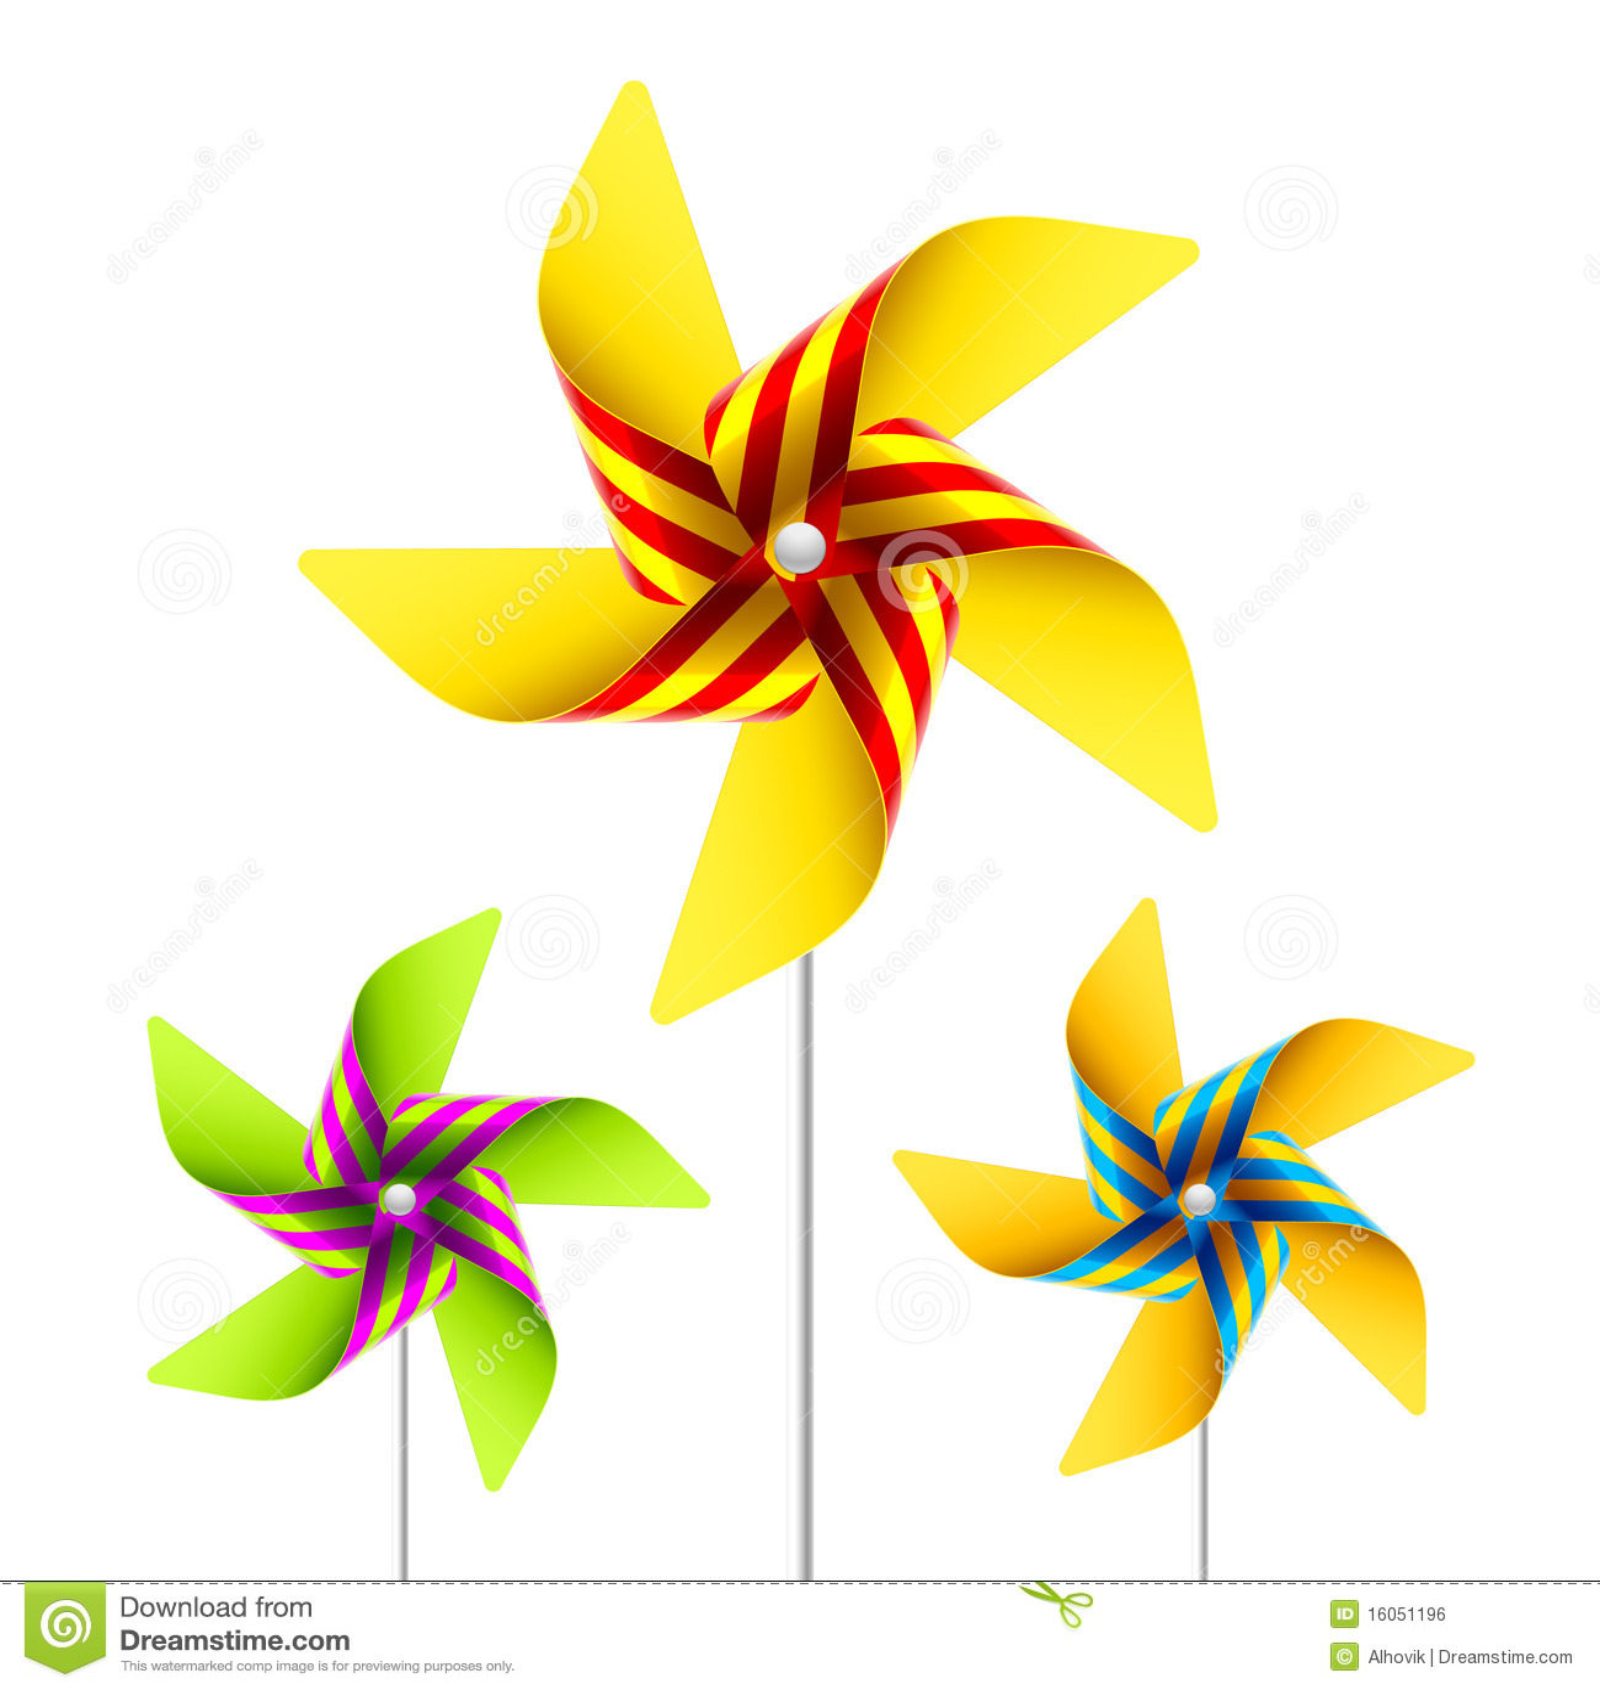 pinwheel stock illustrations 1 278 pinwheel stock illustrations